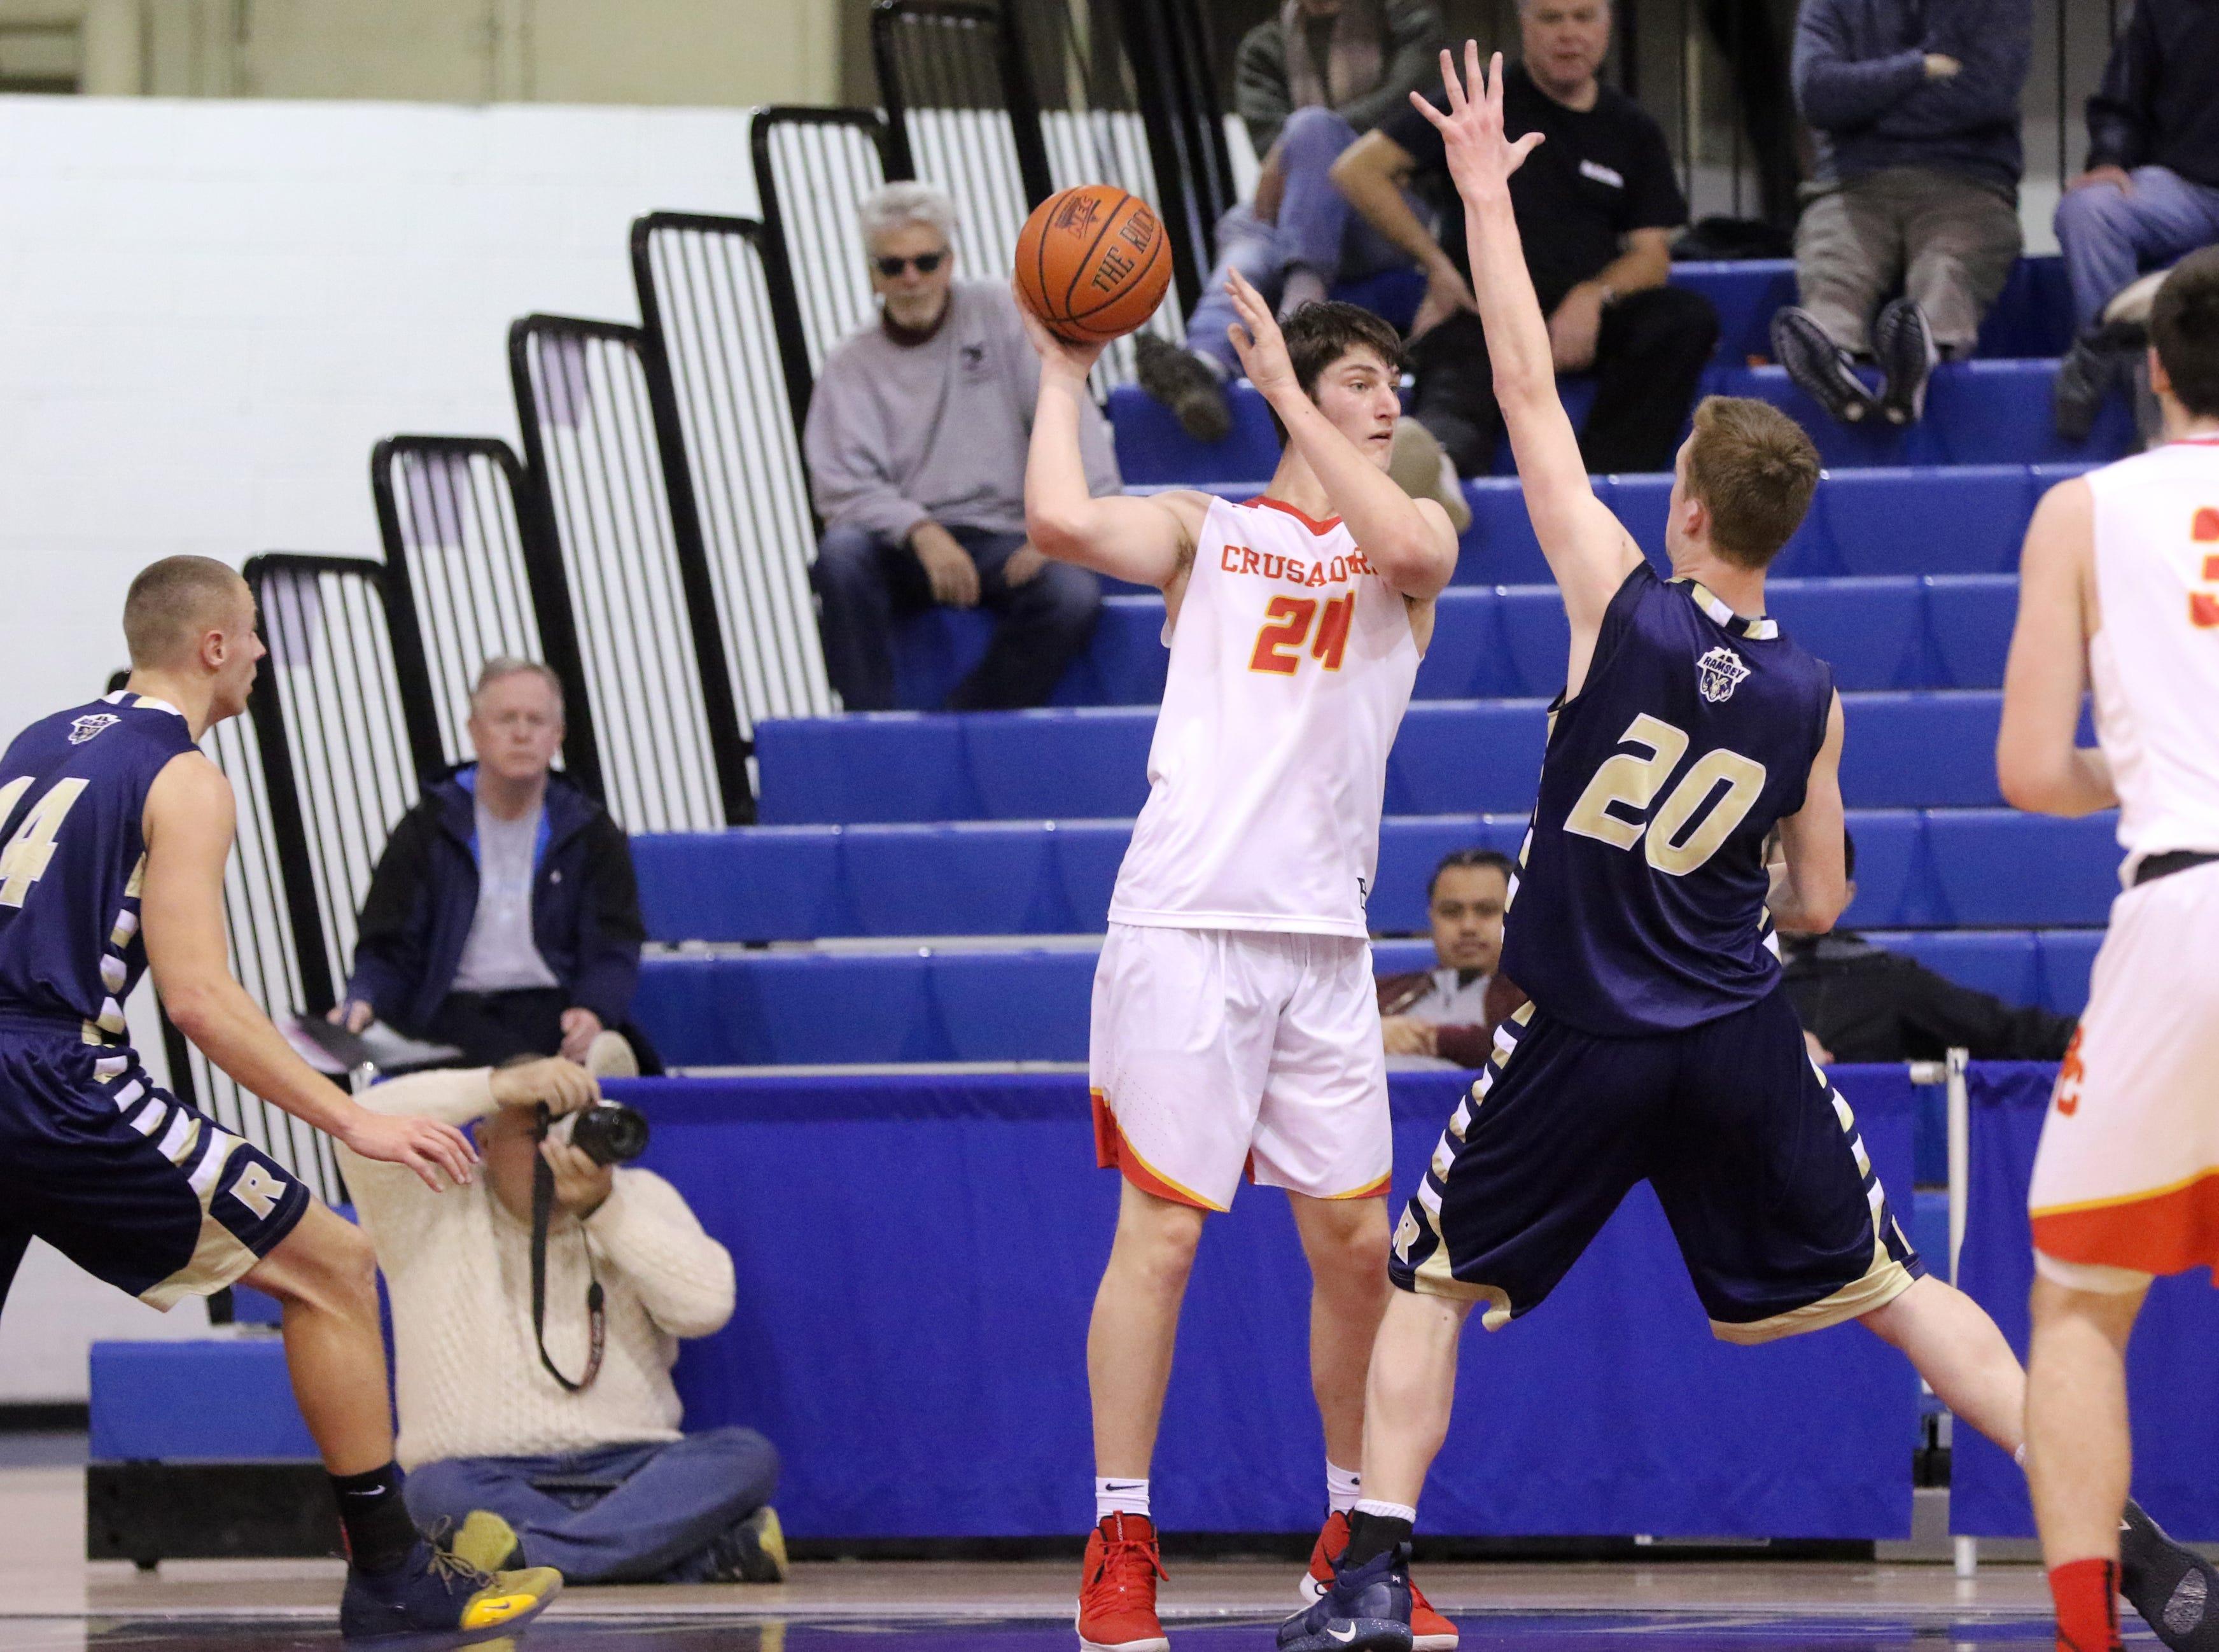 Matt Zona, of Bergen Catholic, tries to pass the ball through defense by Sean Hansen, of Ramsey. Sunday, February 10, 2019